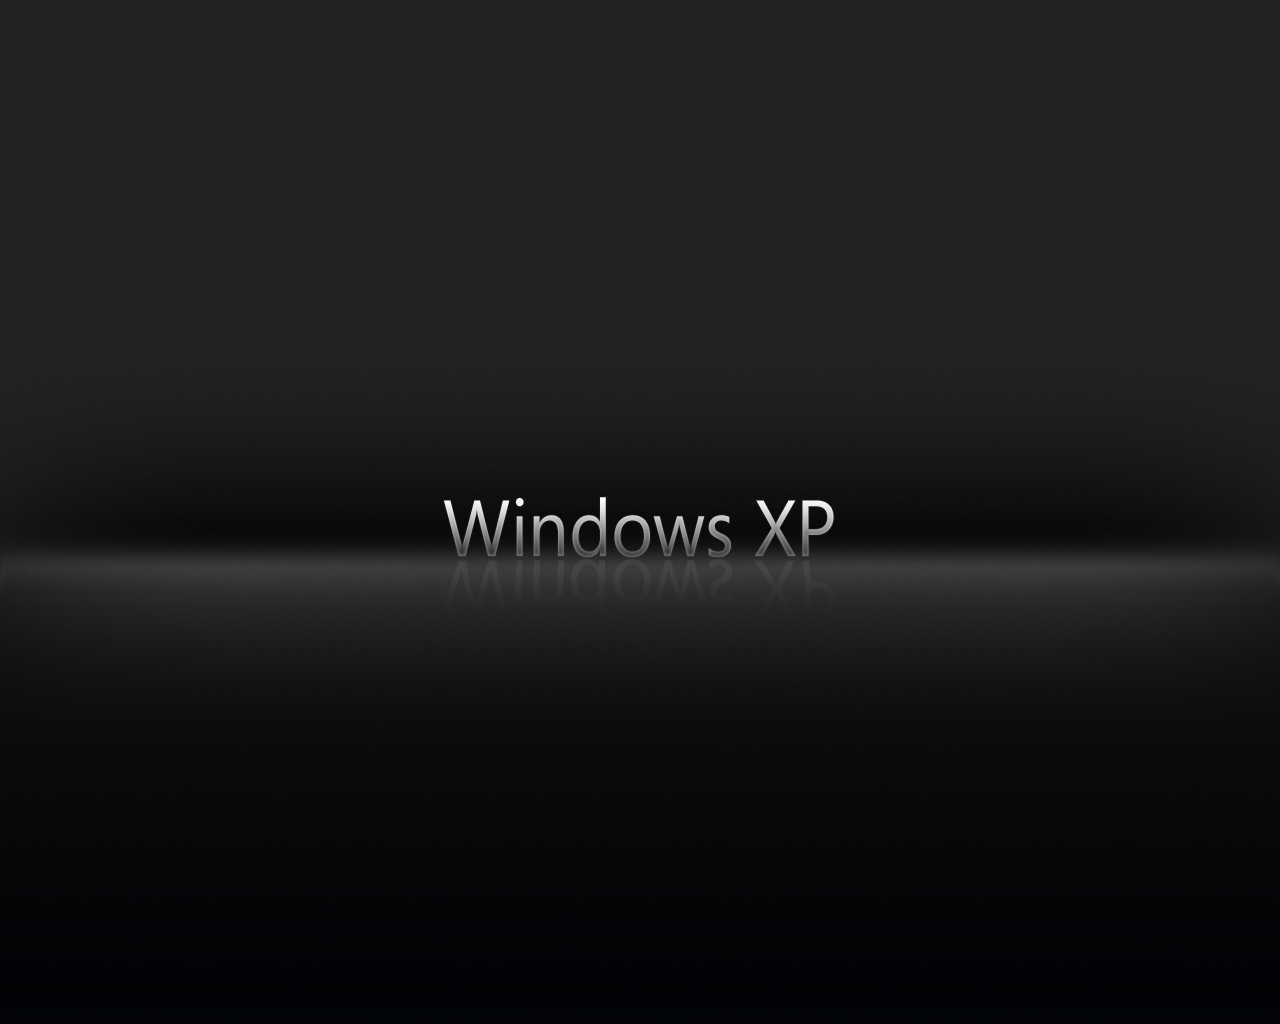 windows xp hd wallpapers backgrounds wallpaper 1280x1024